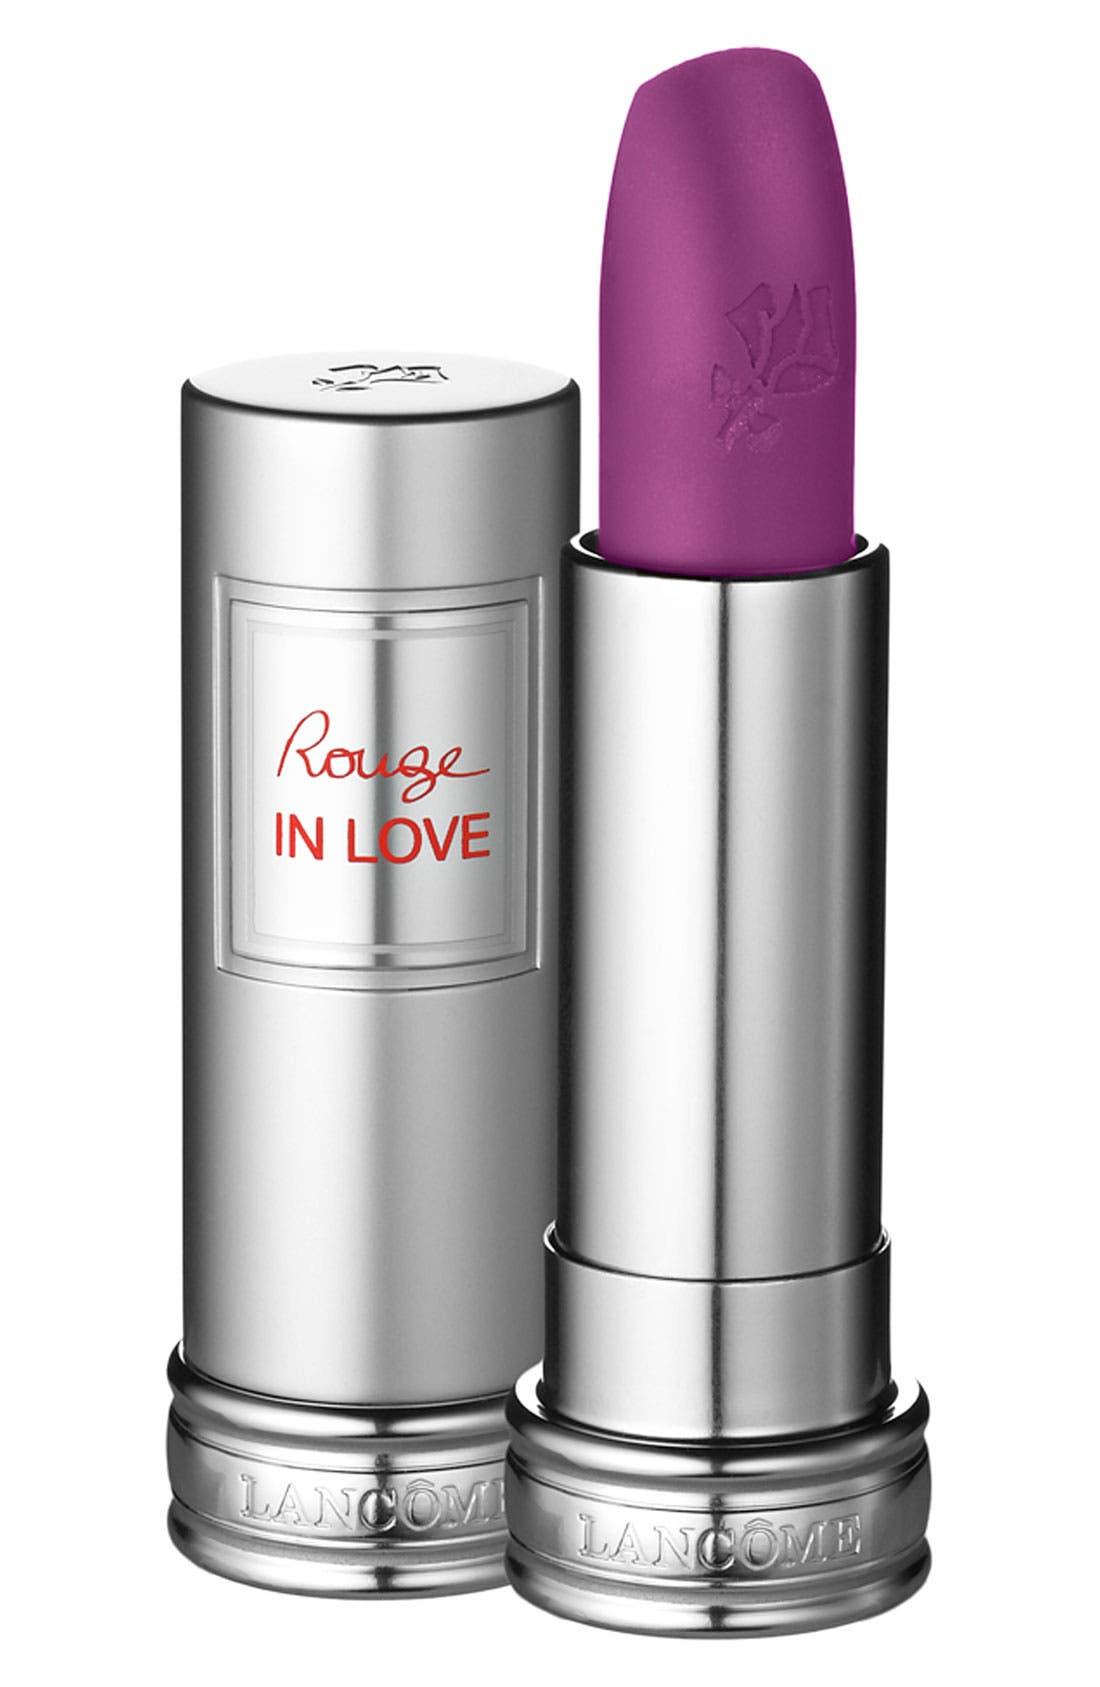 Rouge in Love Lipstick,                             Main thumbnail 1, color,                             VIOLETTE COQUETTE